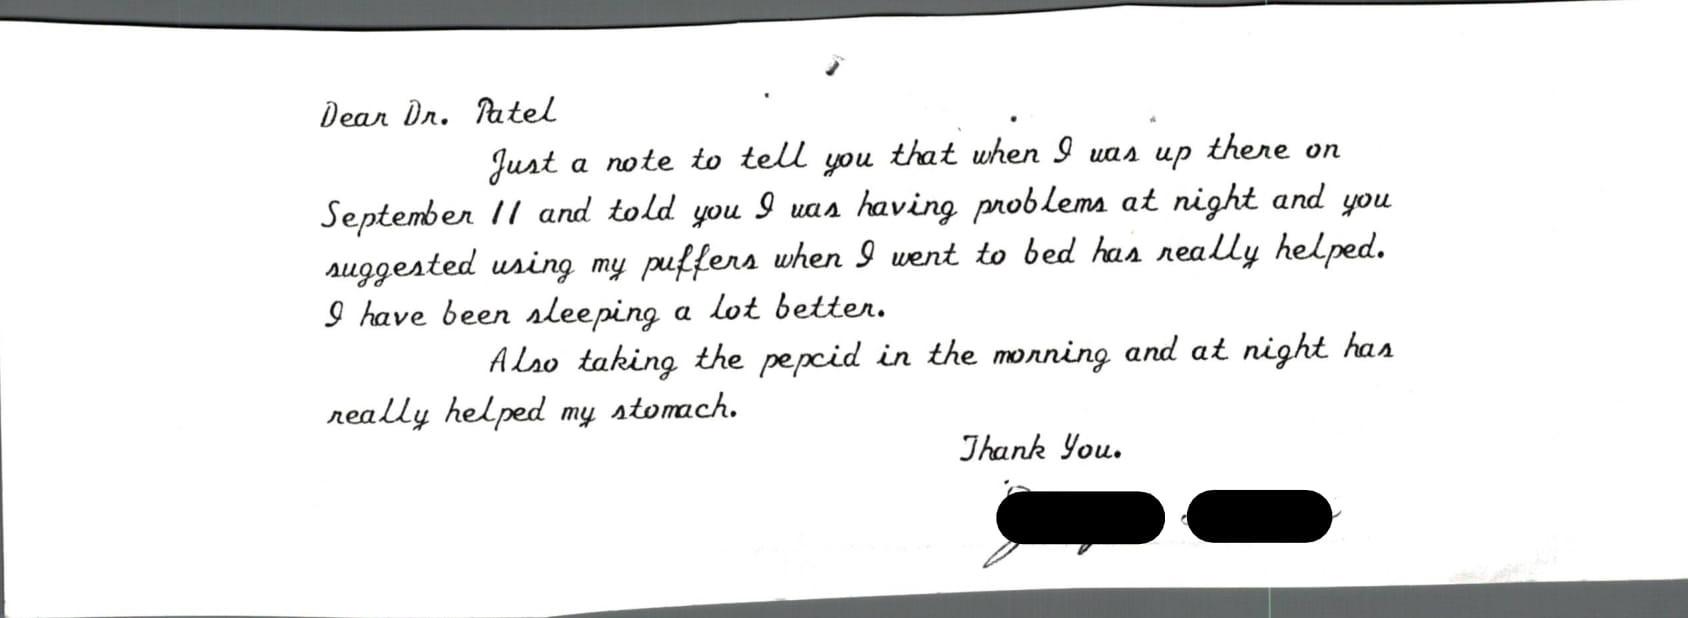 Patient letters folder 1-151-211-49.jpg